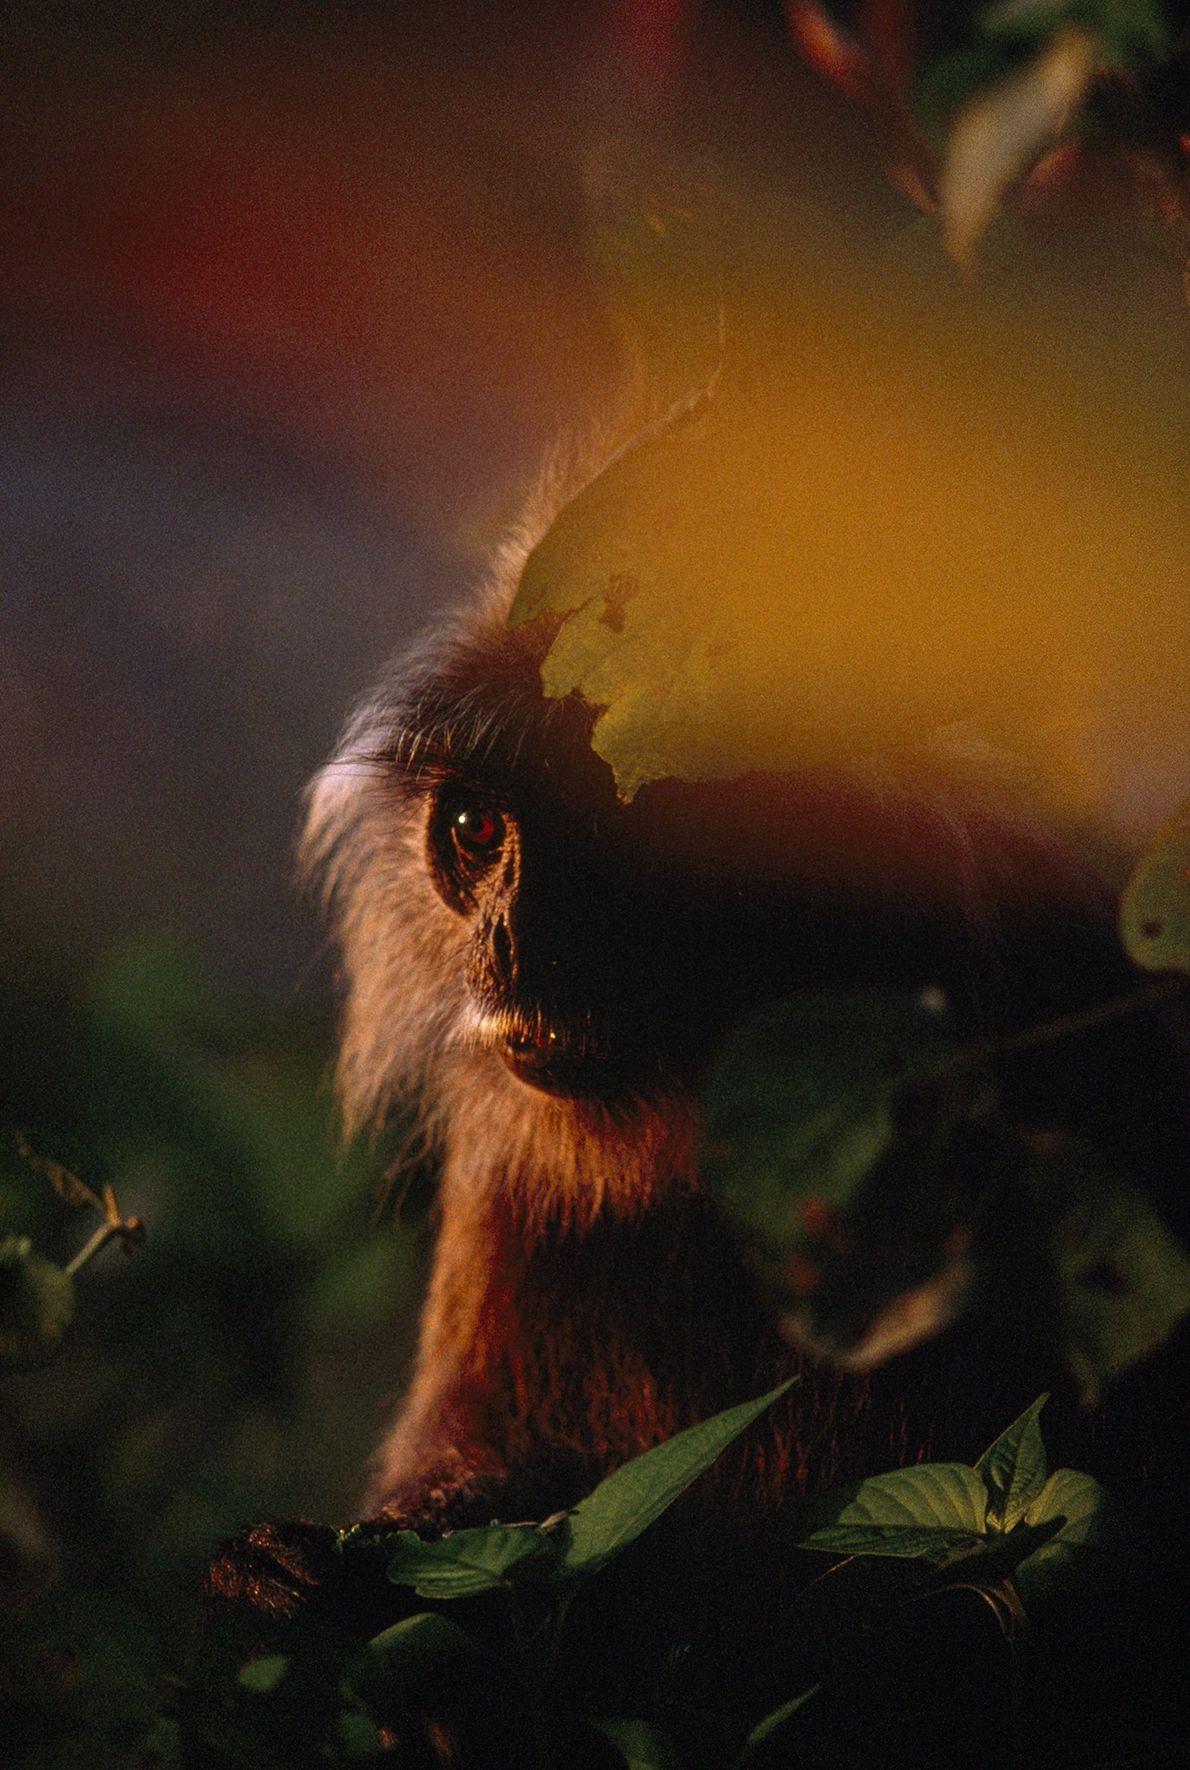 Macaco-folha-prateado